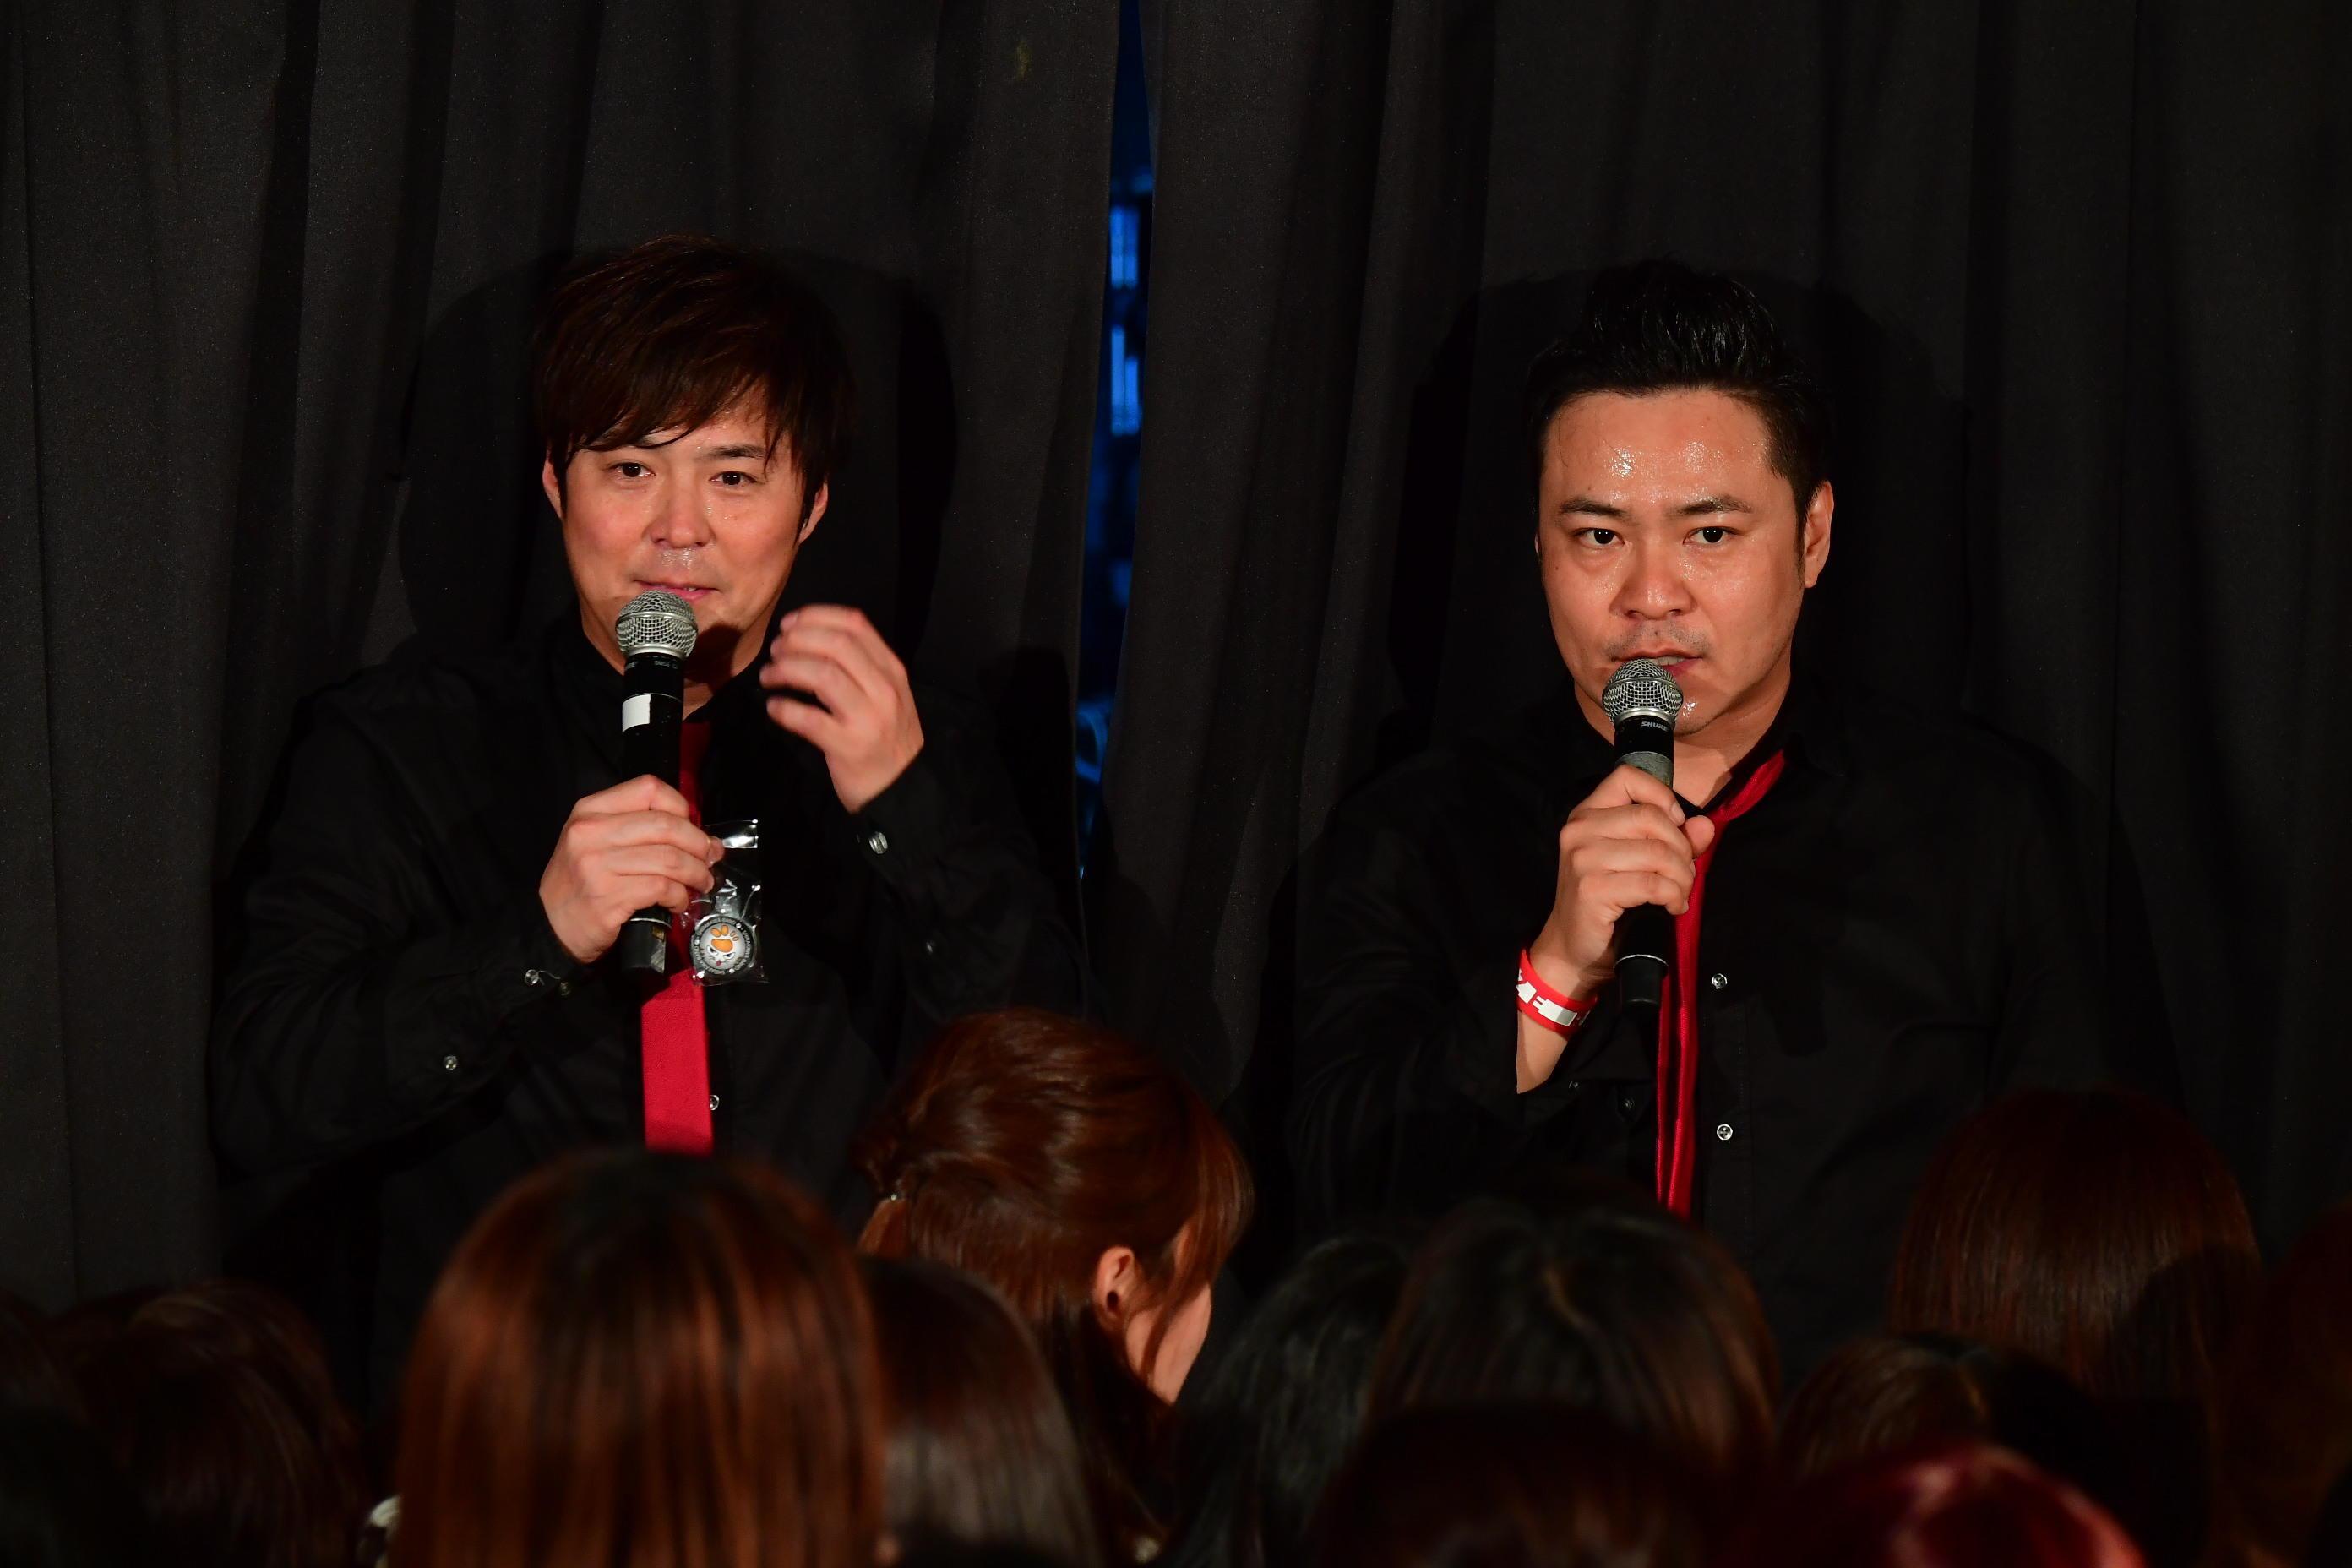 http://news.yoshimoto.co.jp/20180331130114-1fcbc903923f82c8b059aeef262a03d74da819de.jpg